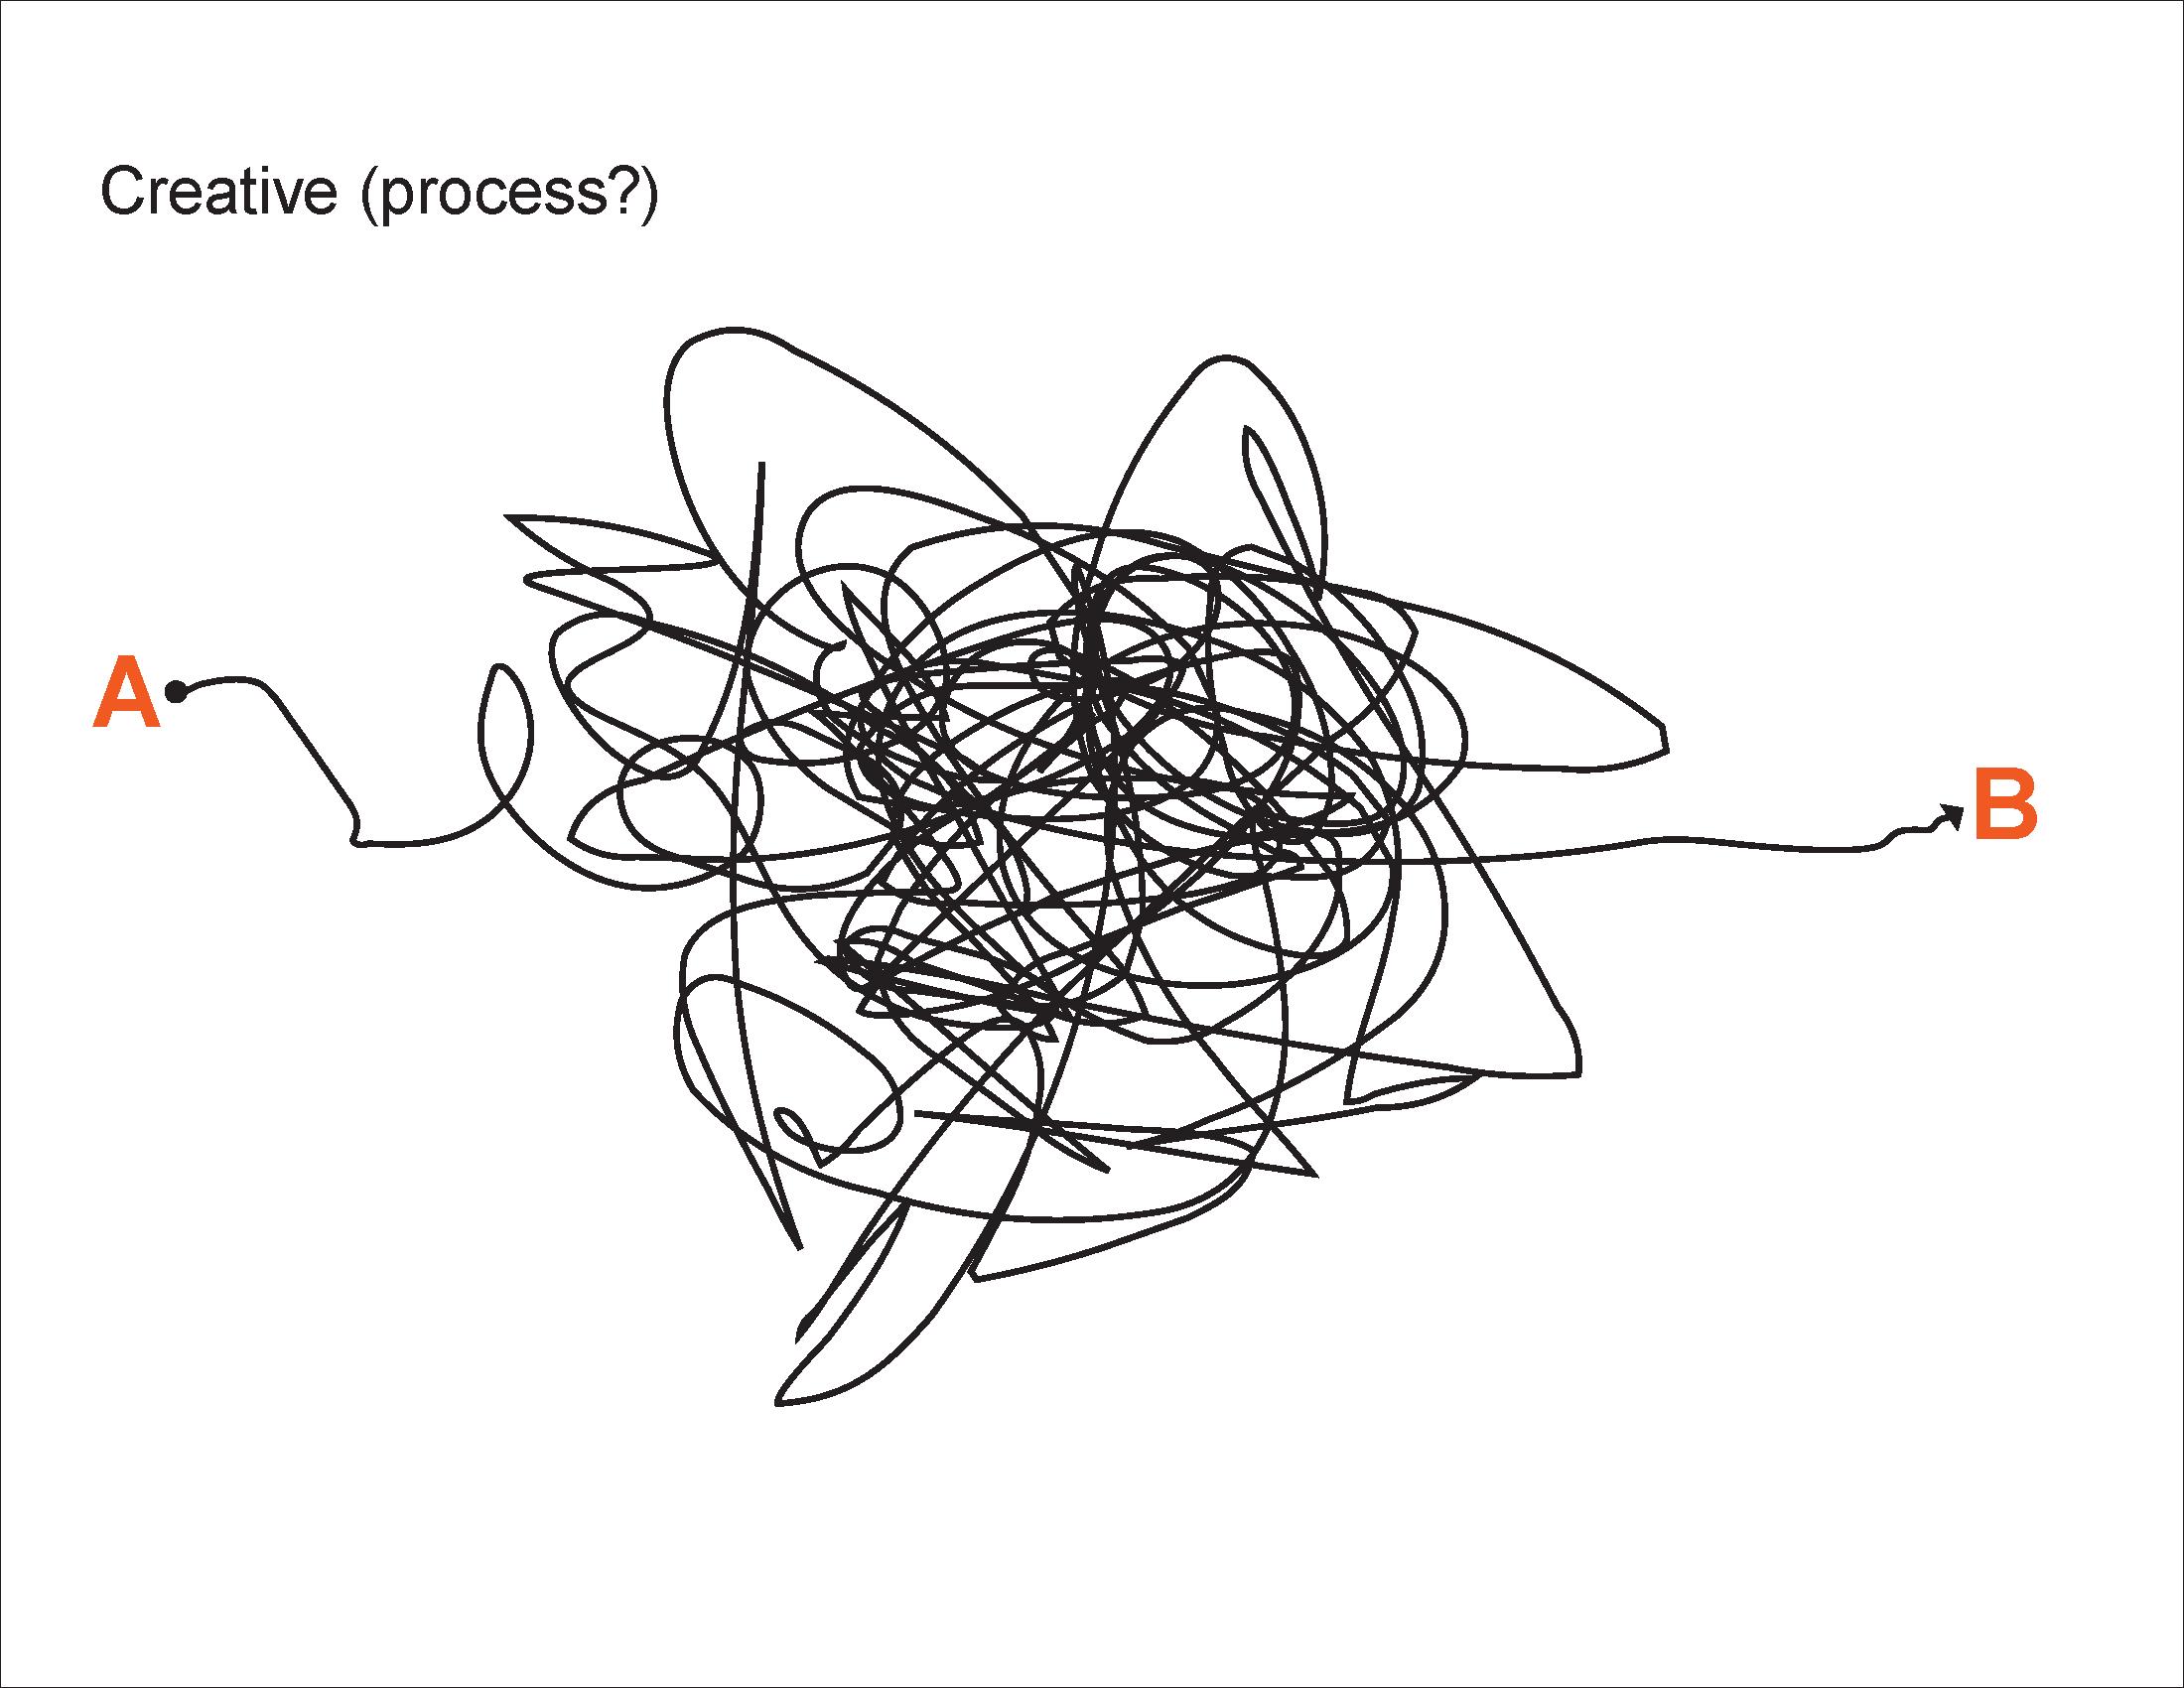 Creative process?